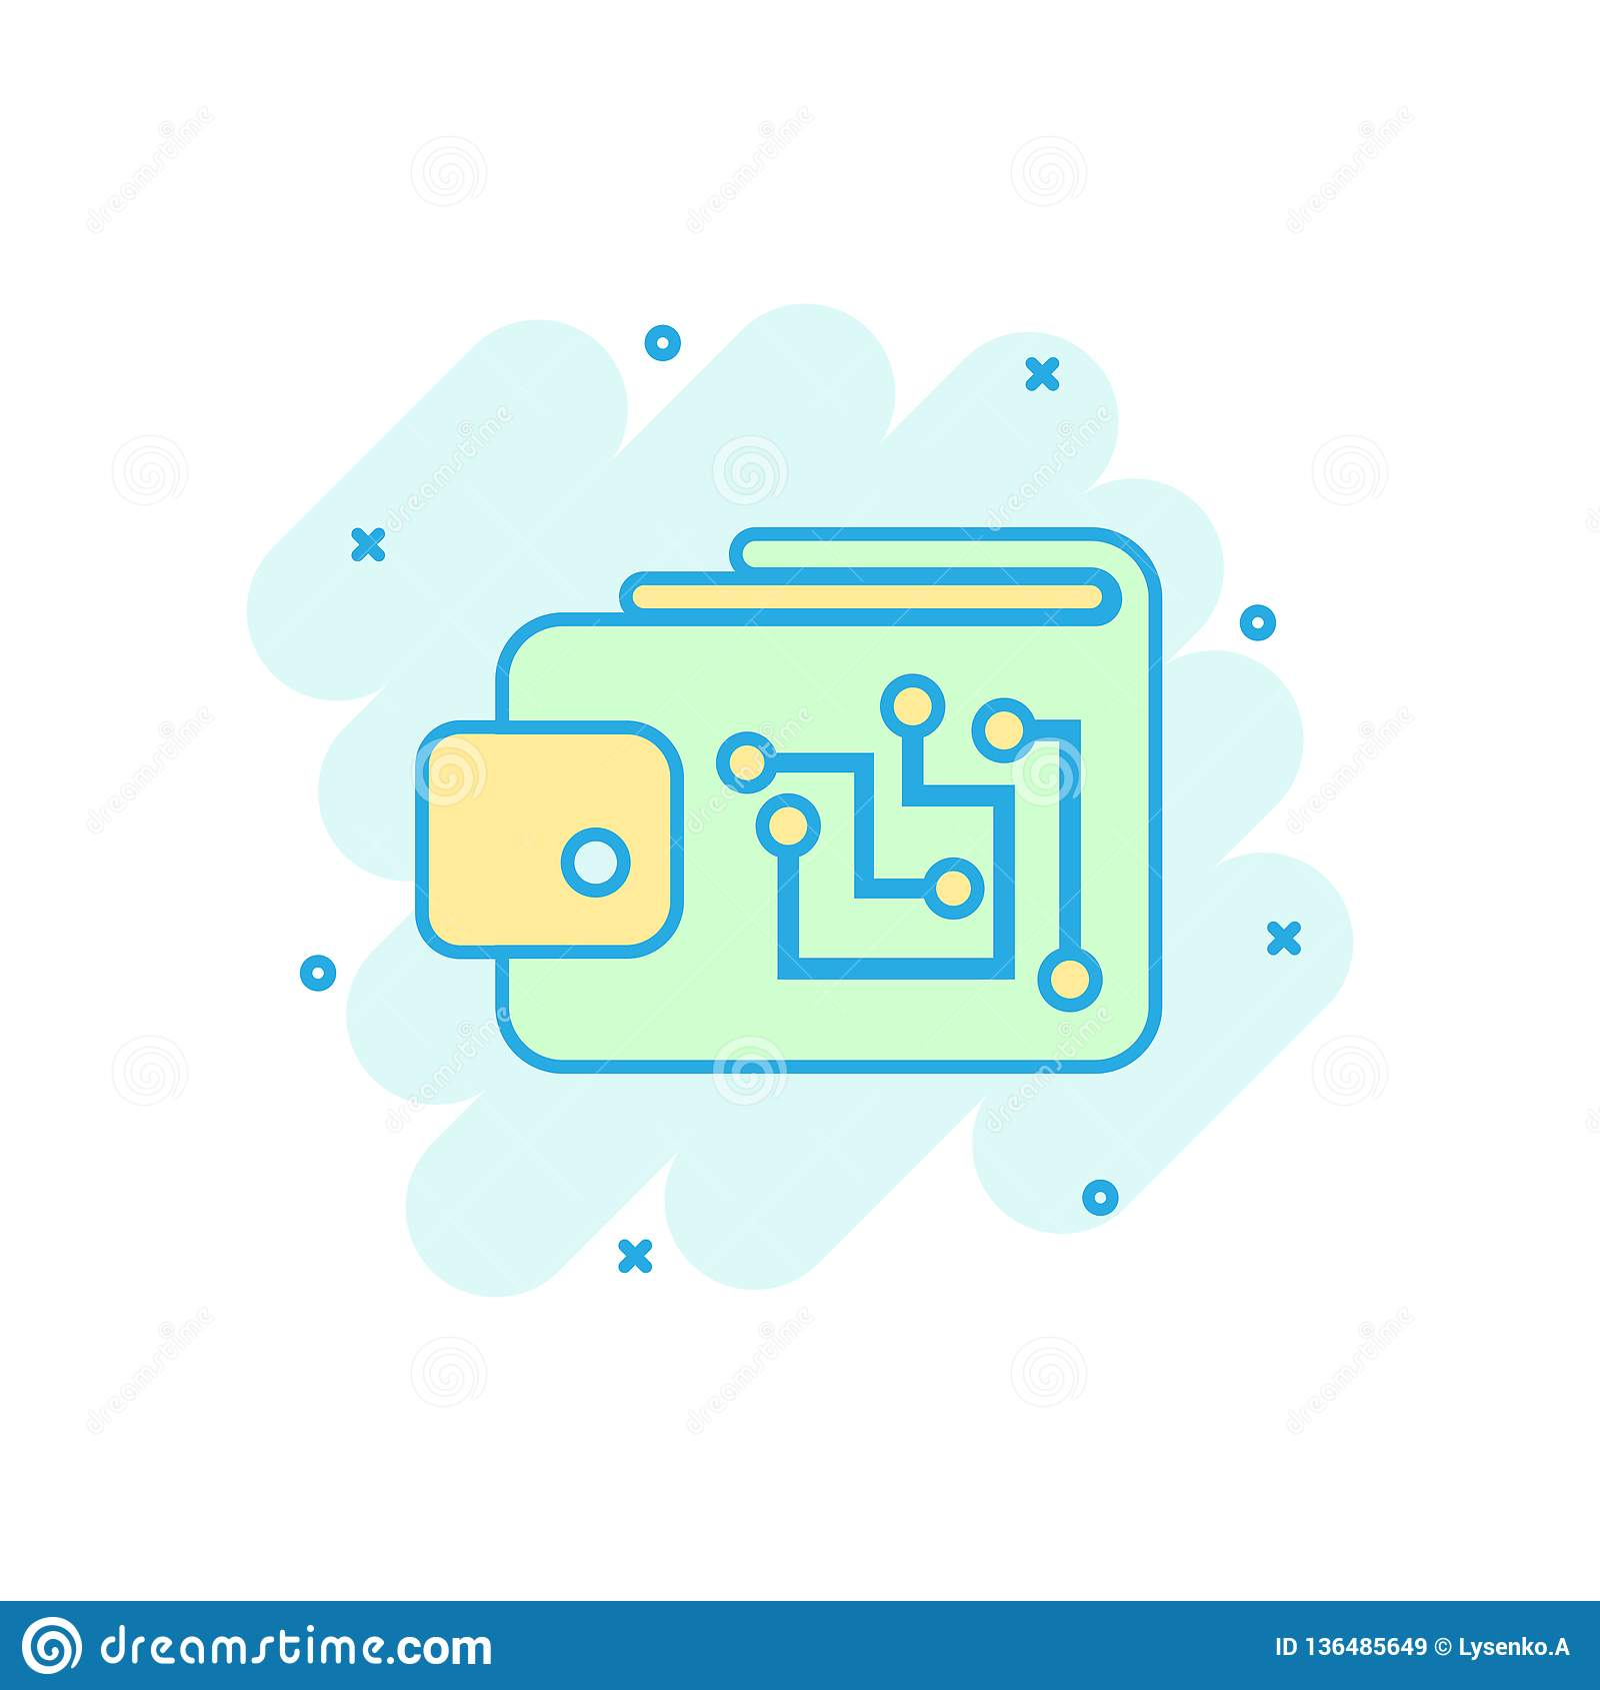 Digital wallet icon in comic style crypto bag vector cartoon illustration pictogram online finance e commerce business concept splash effect